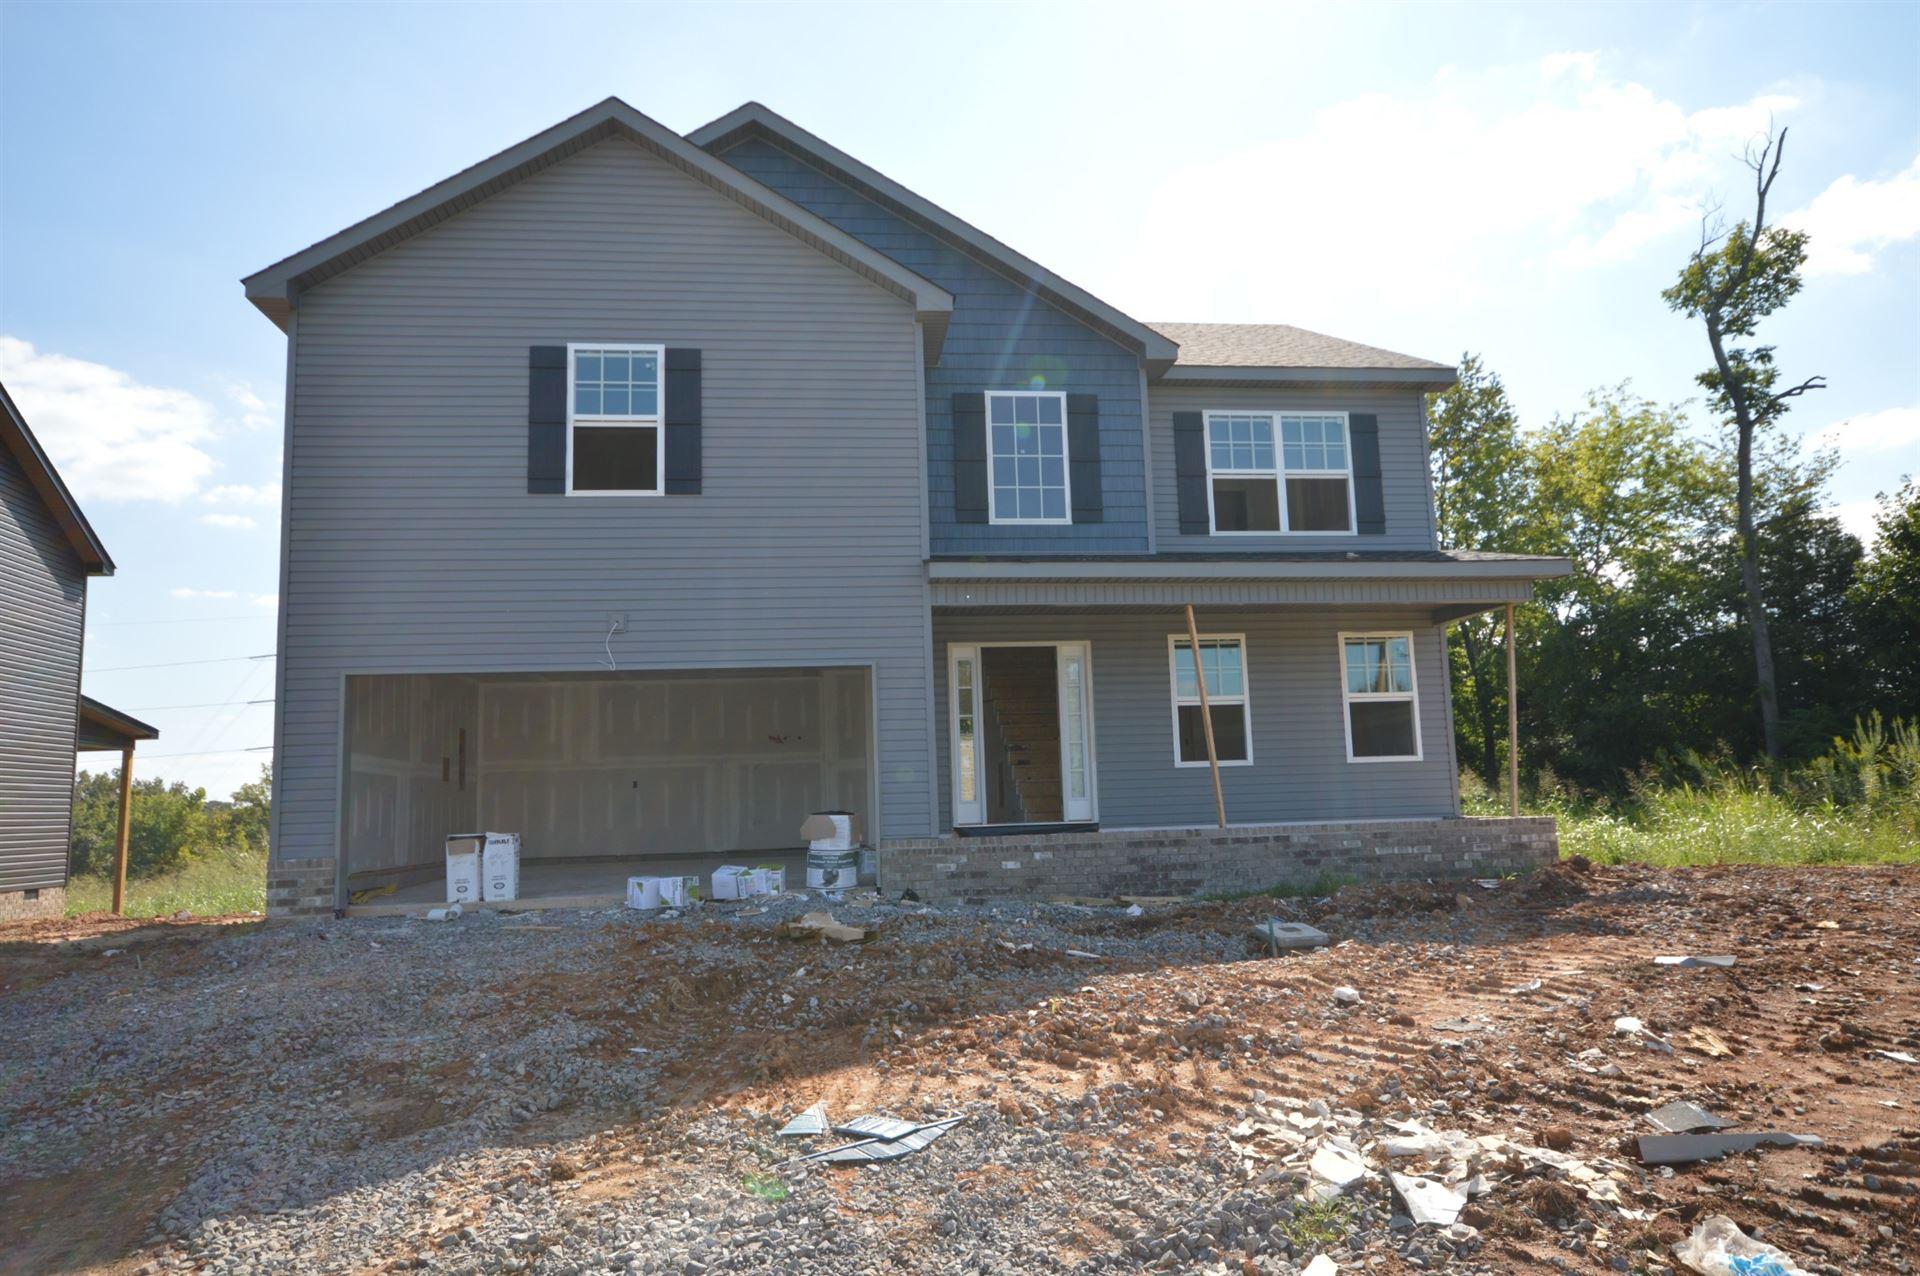 54 Woodland Springs, Clarksville, TN 37042 - MLS#: 2288191